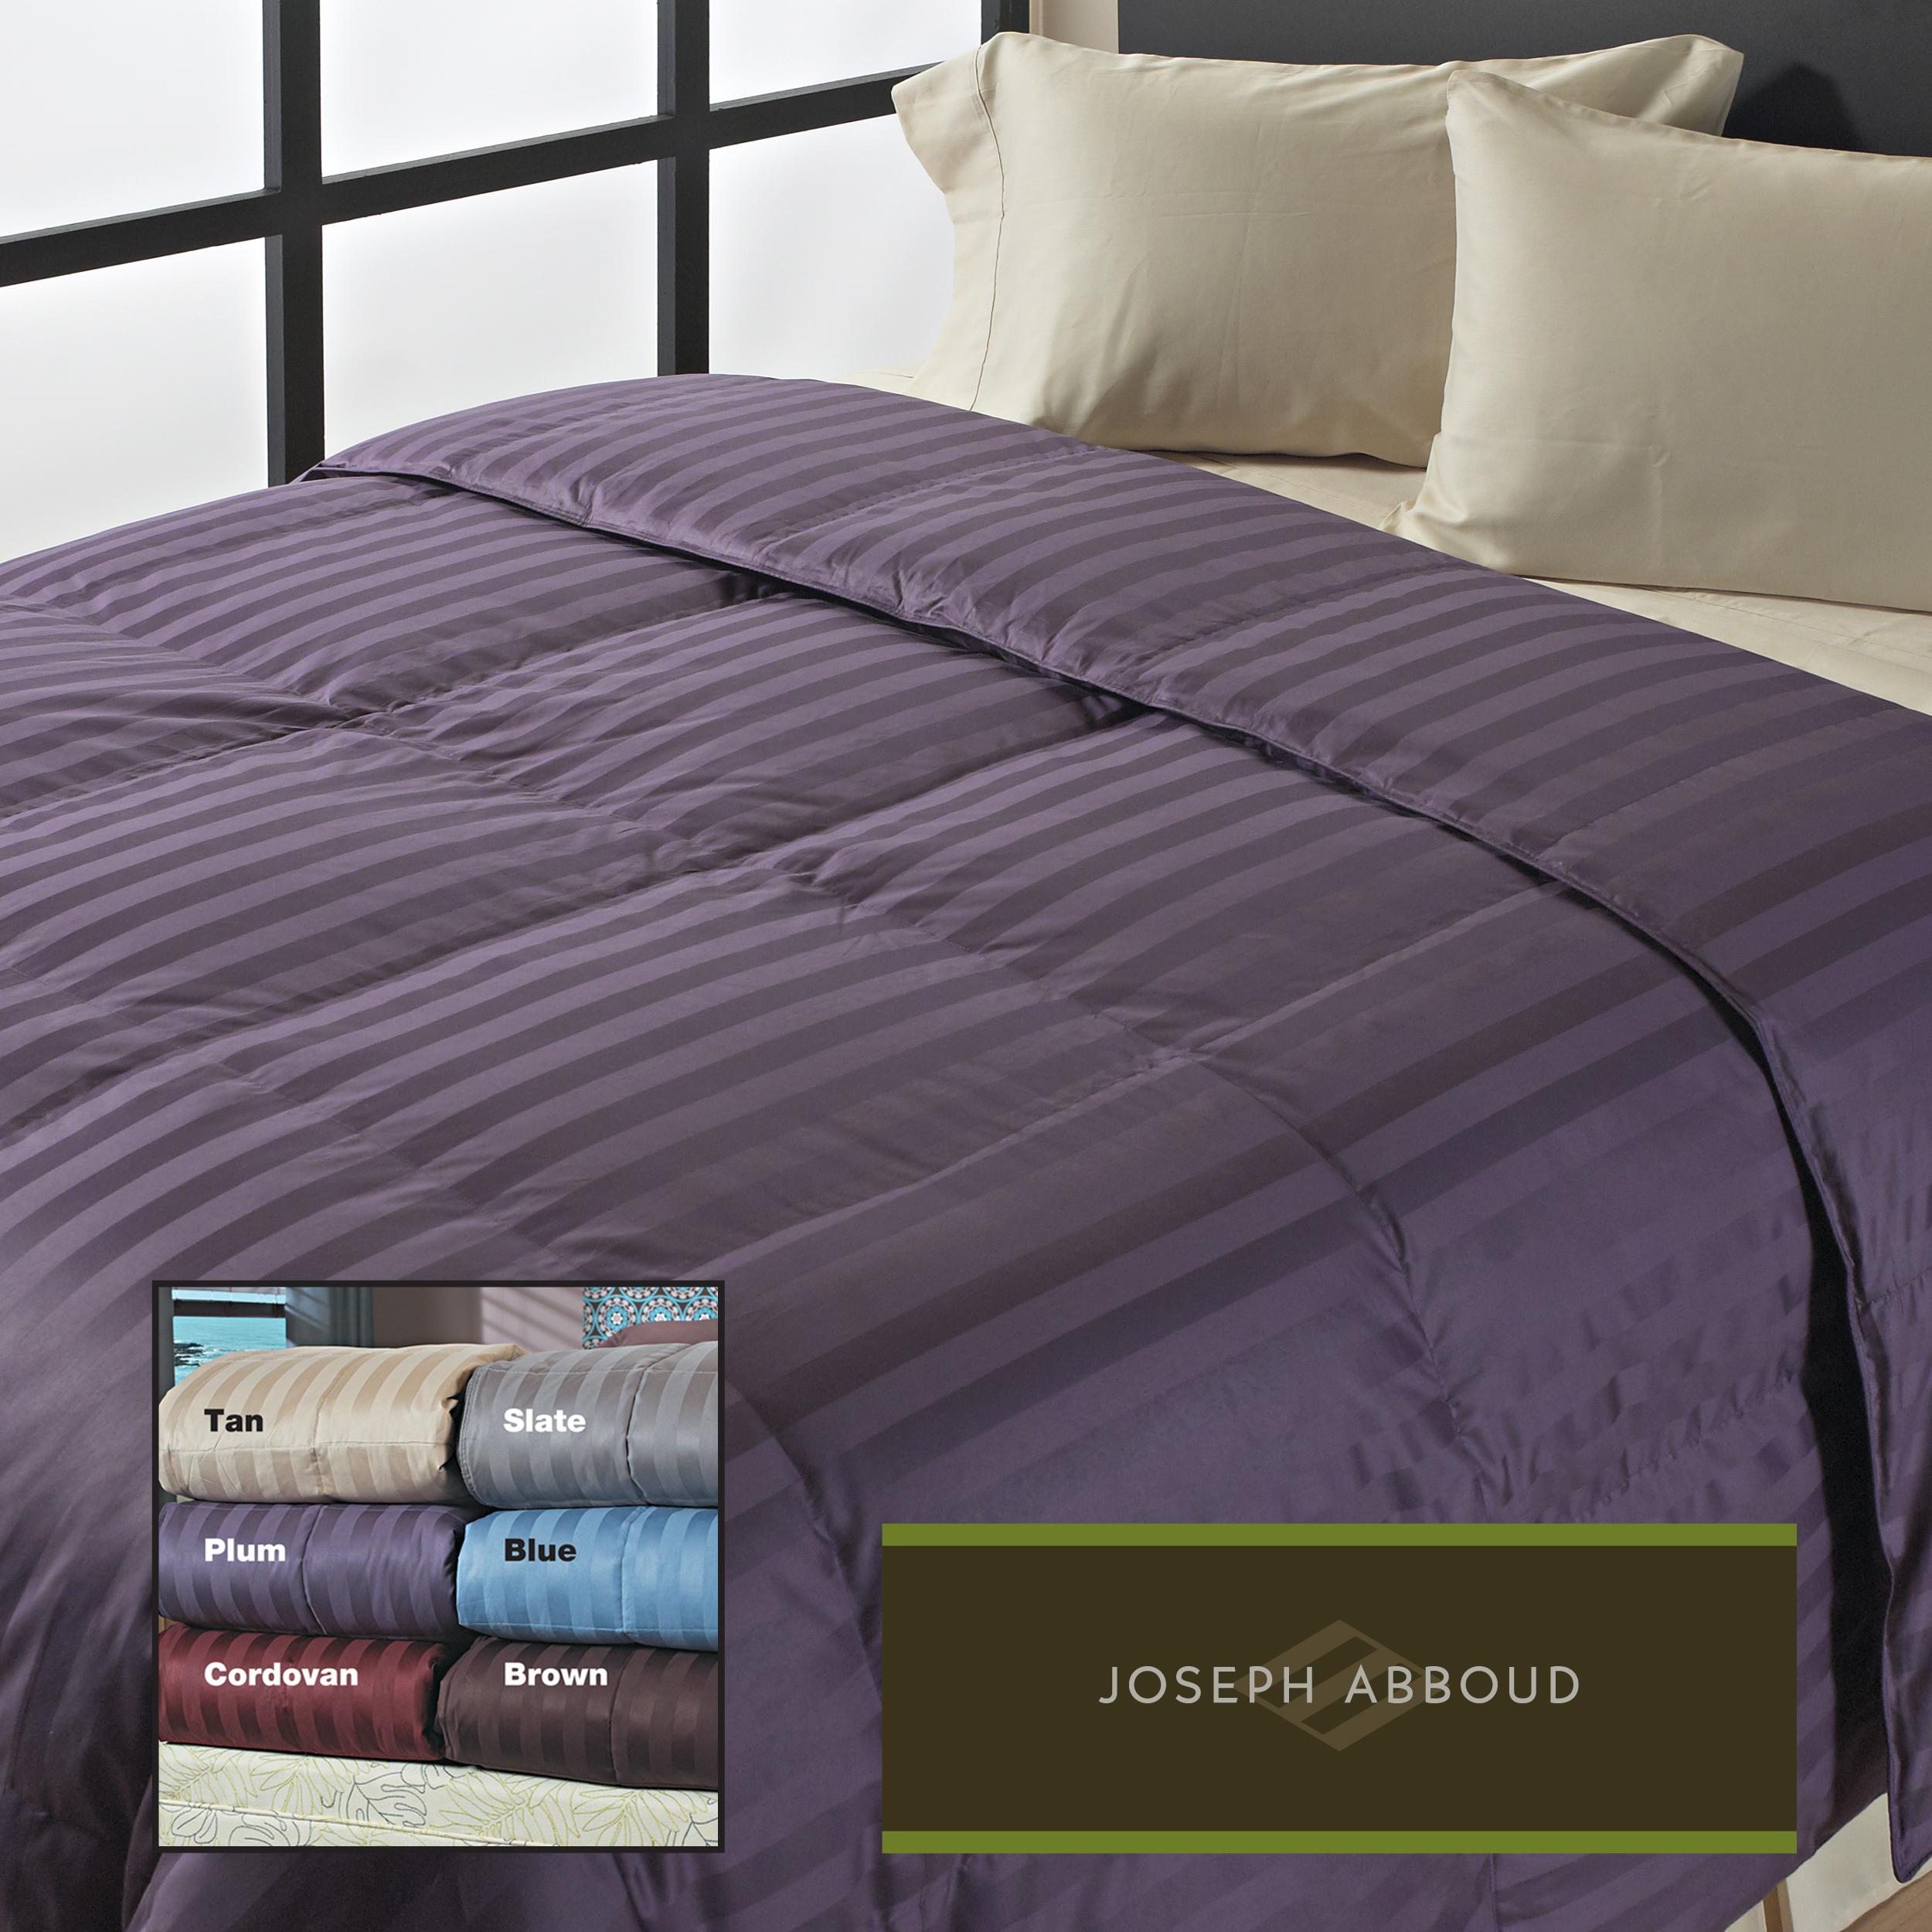 Joseph Abboud Classic Wide Stripe 400 Thread Count Down-Like Comforter